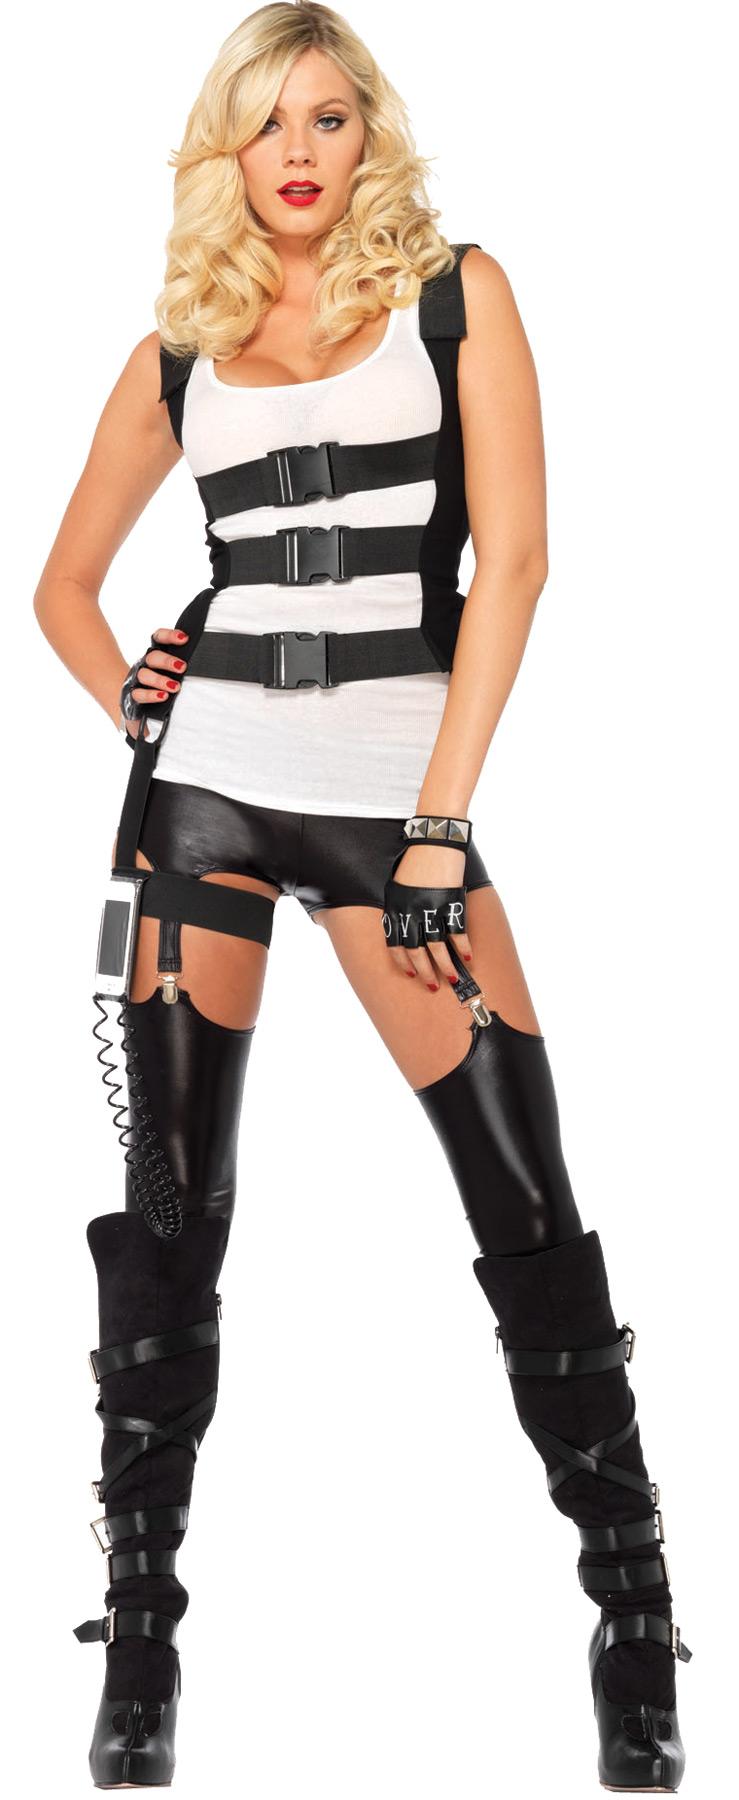 Swat Body Harness Ad Sm Medium-img-0